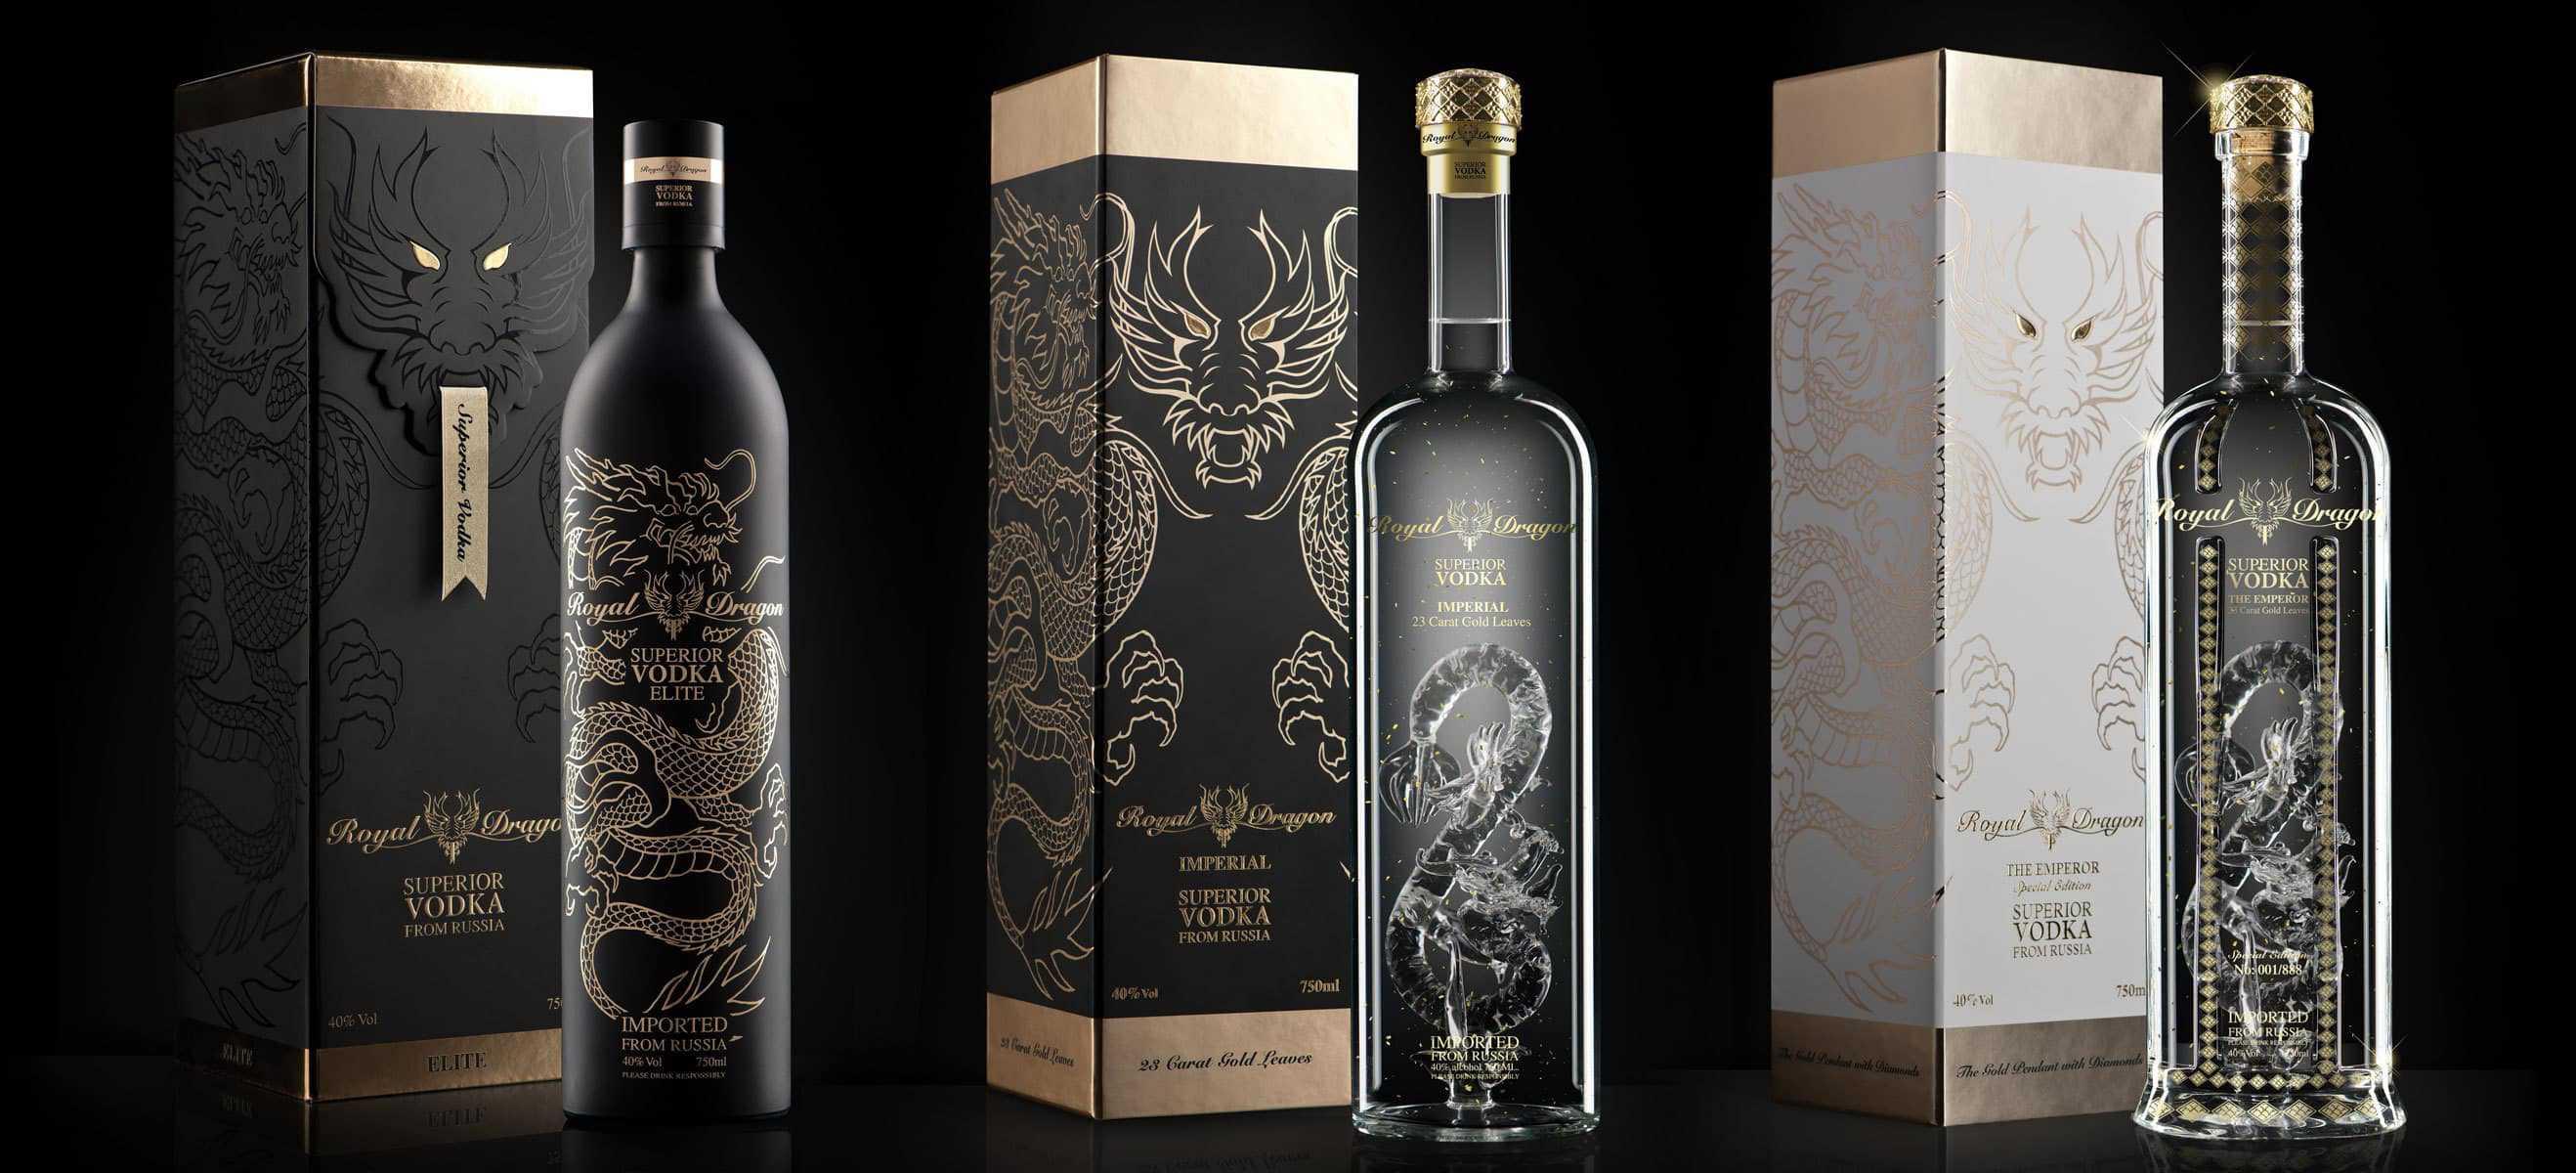 Royal dragon vodka 23 carat gold bevmo cheats for dragon story gold